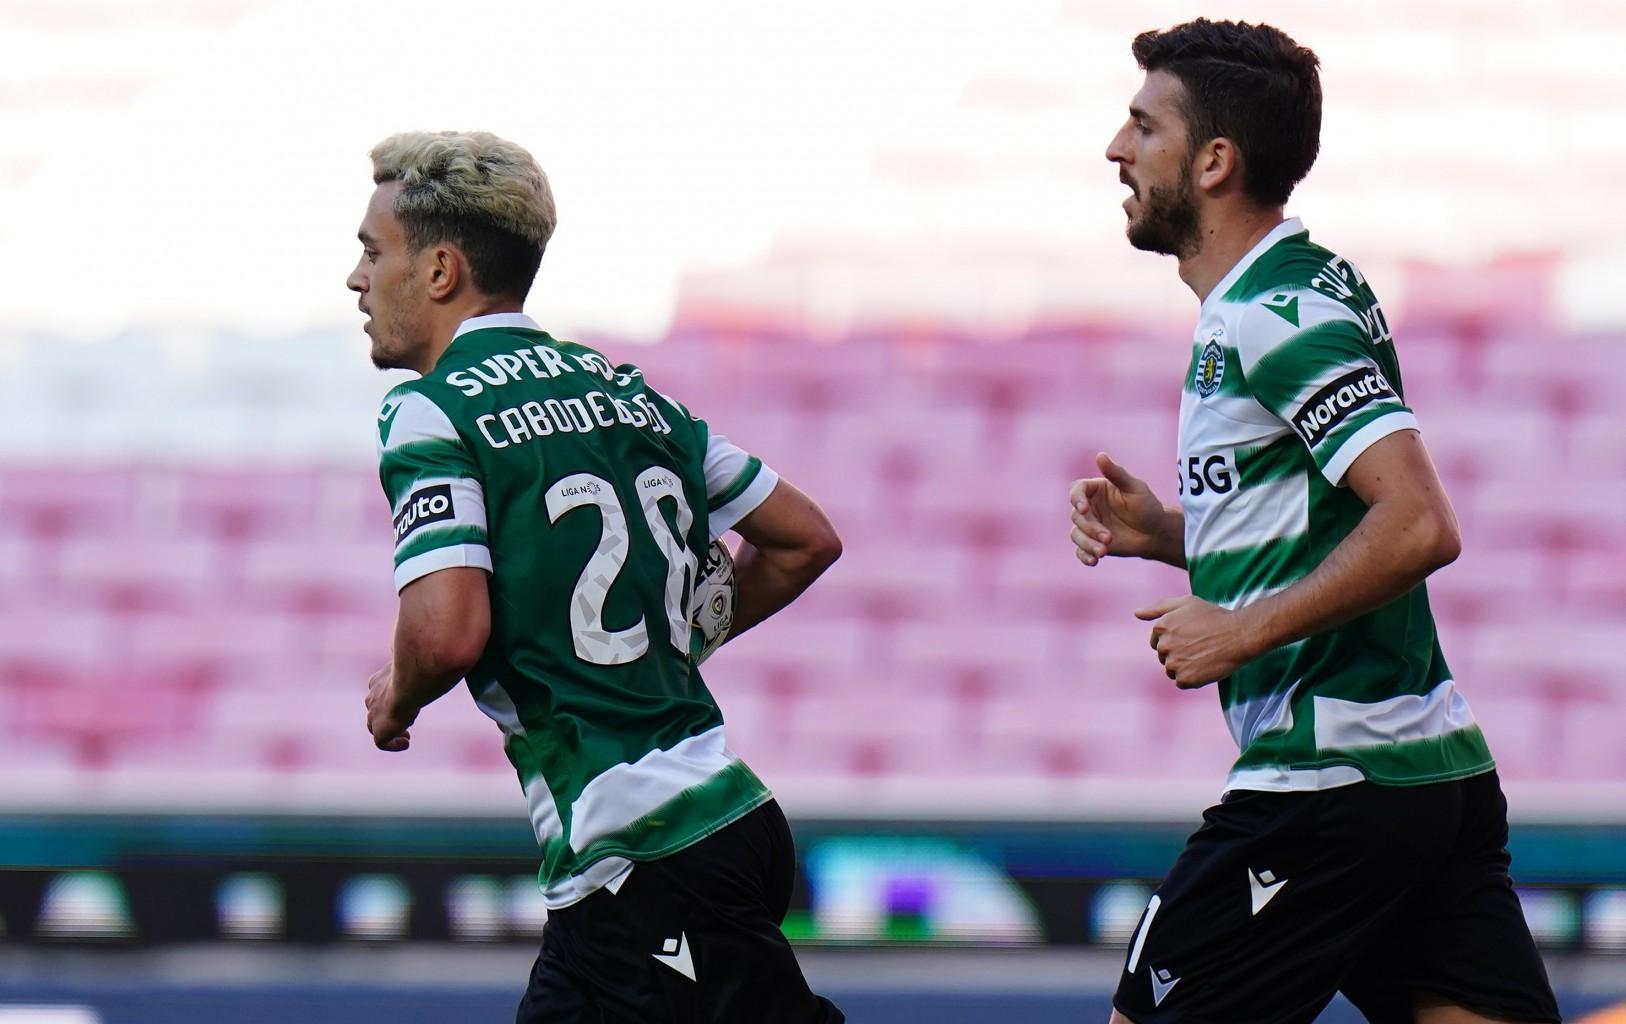 Con triplete de Pedro Gonçalves, Sporting Lisboa goleó a Marítimo 5 - 1